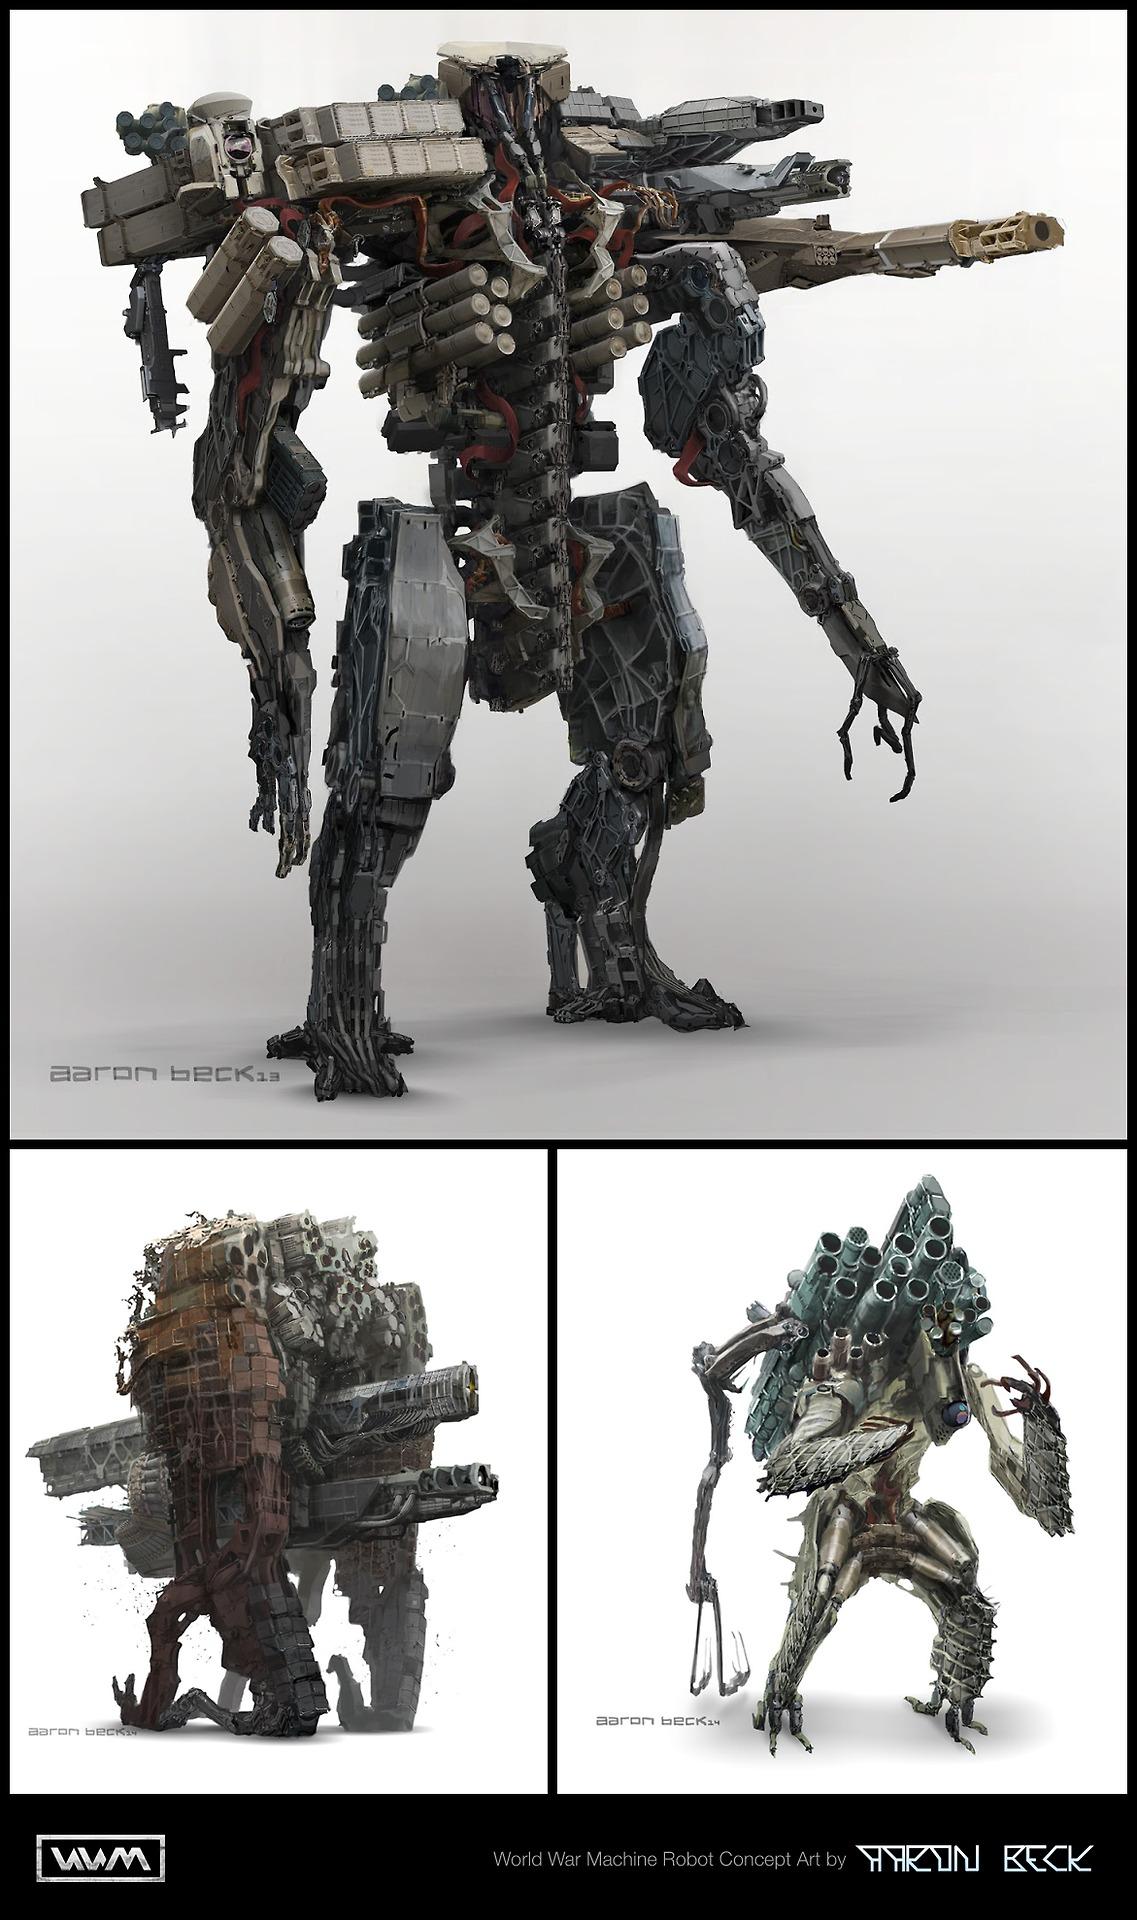 World War Machine Concept Art